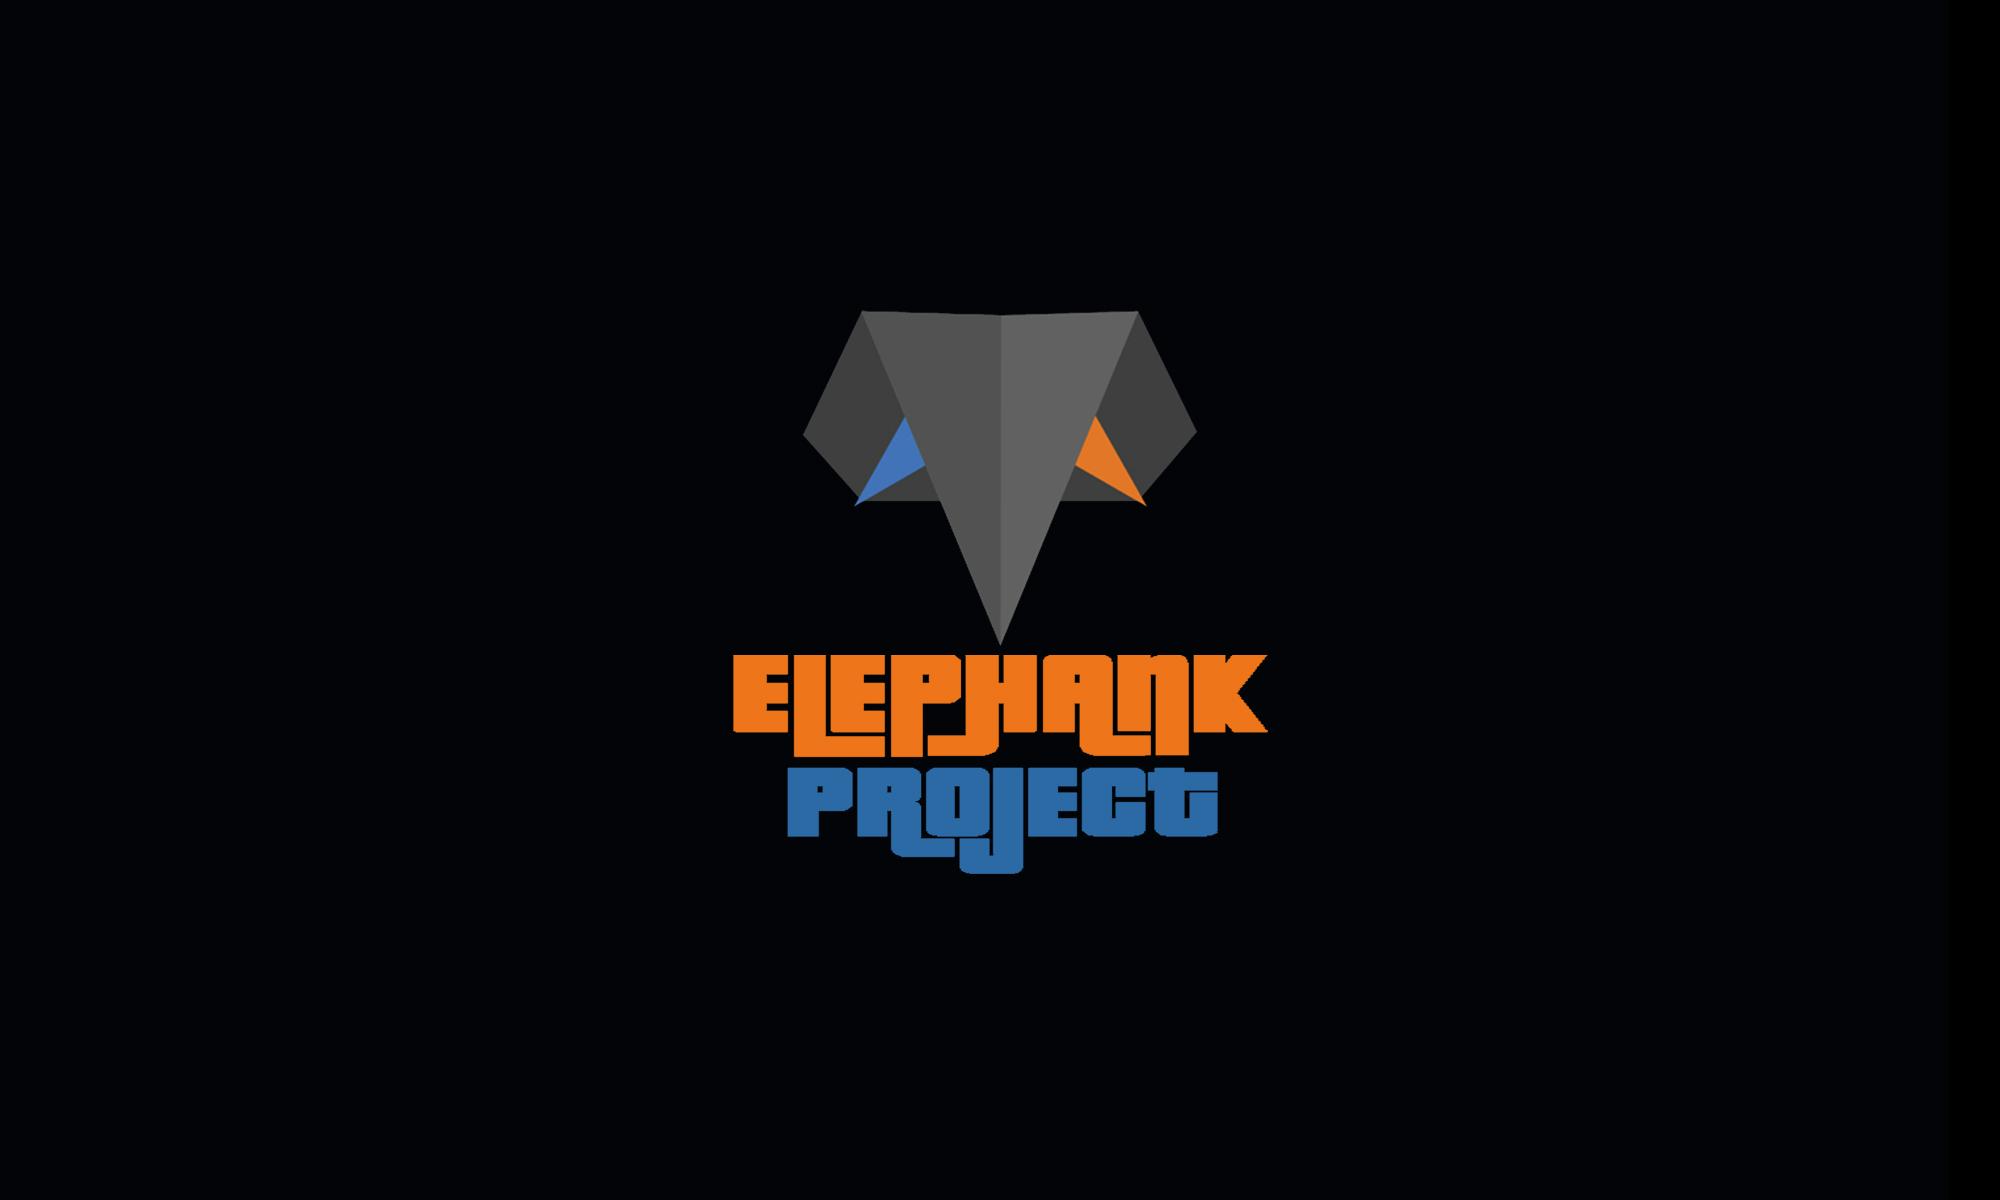 Elephank Project